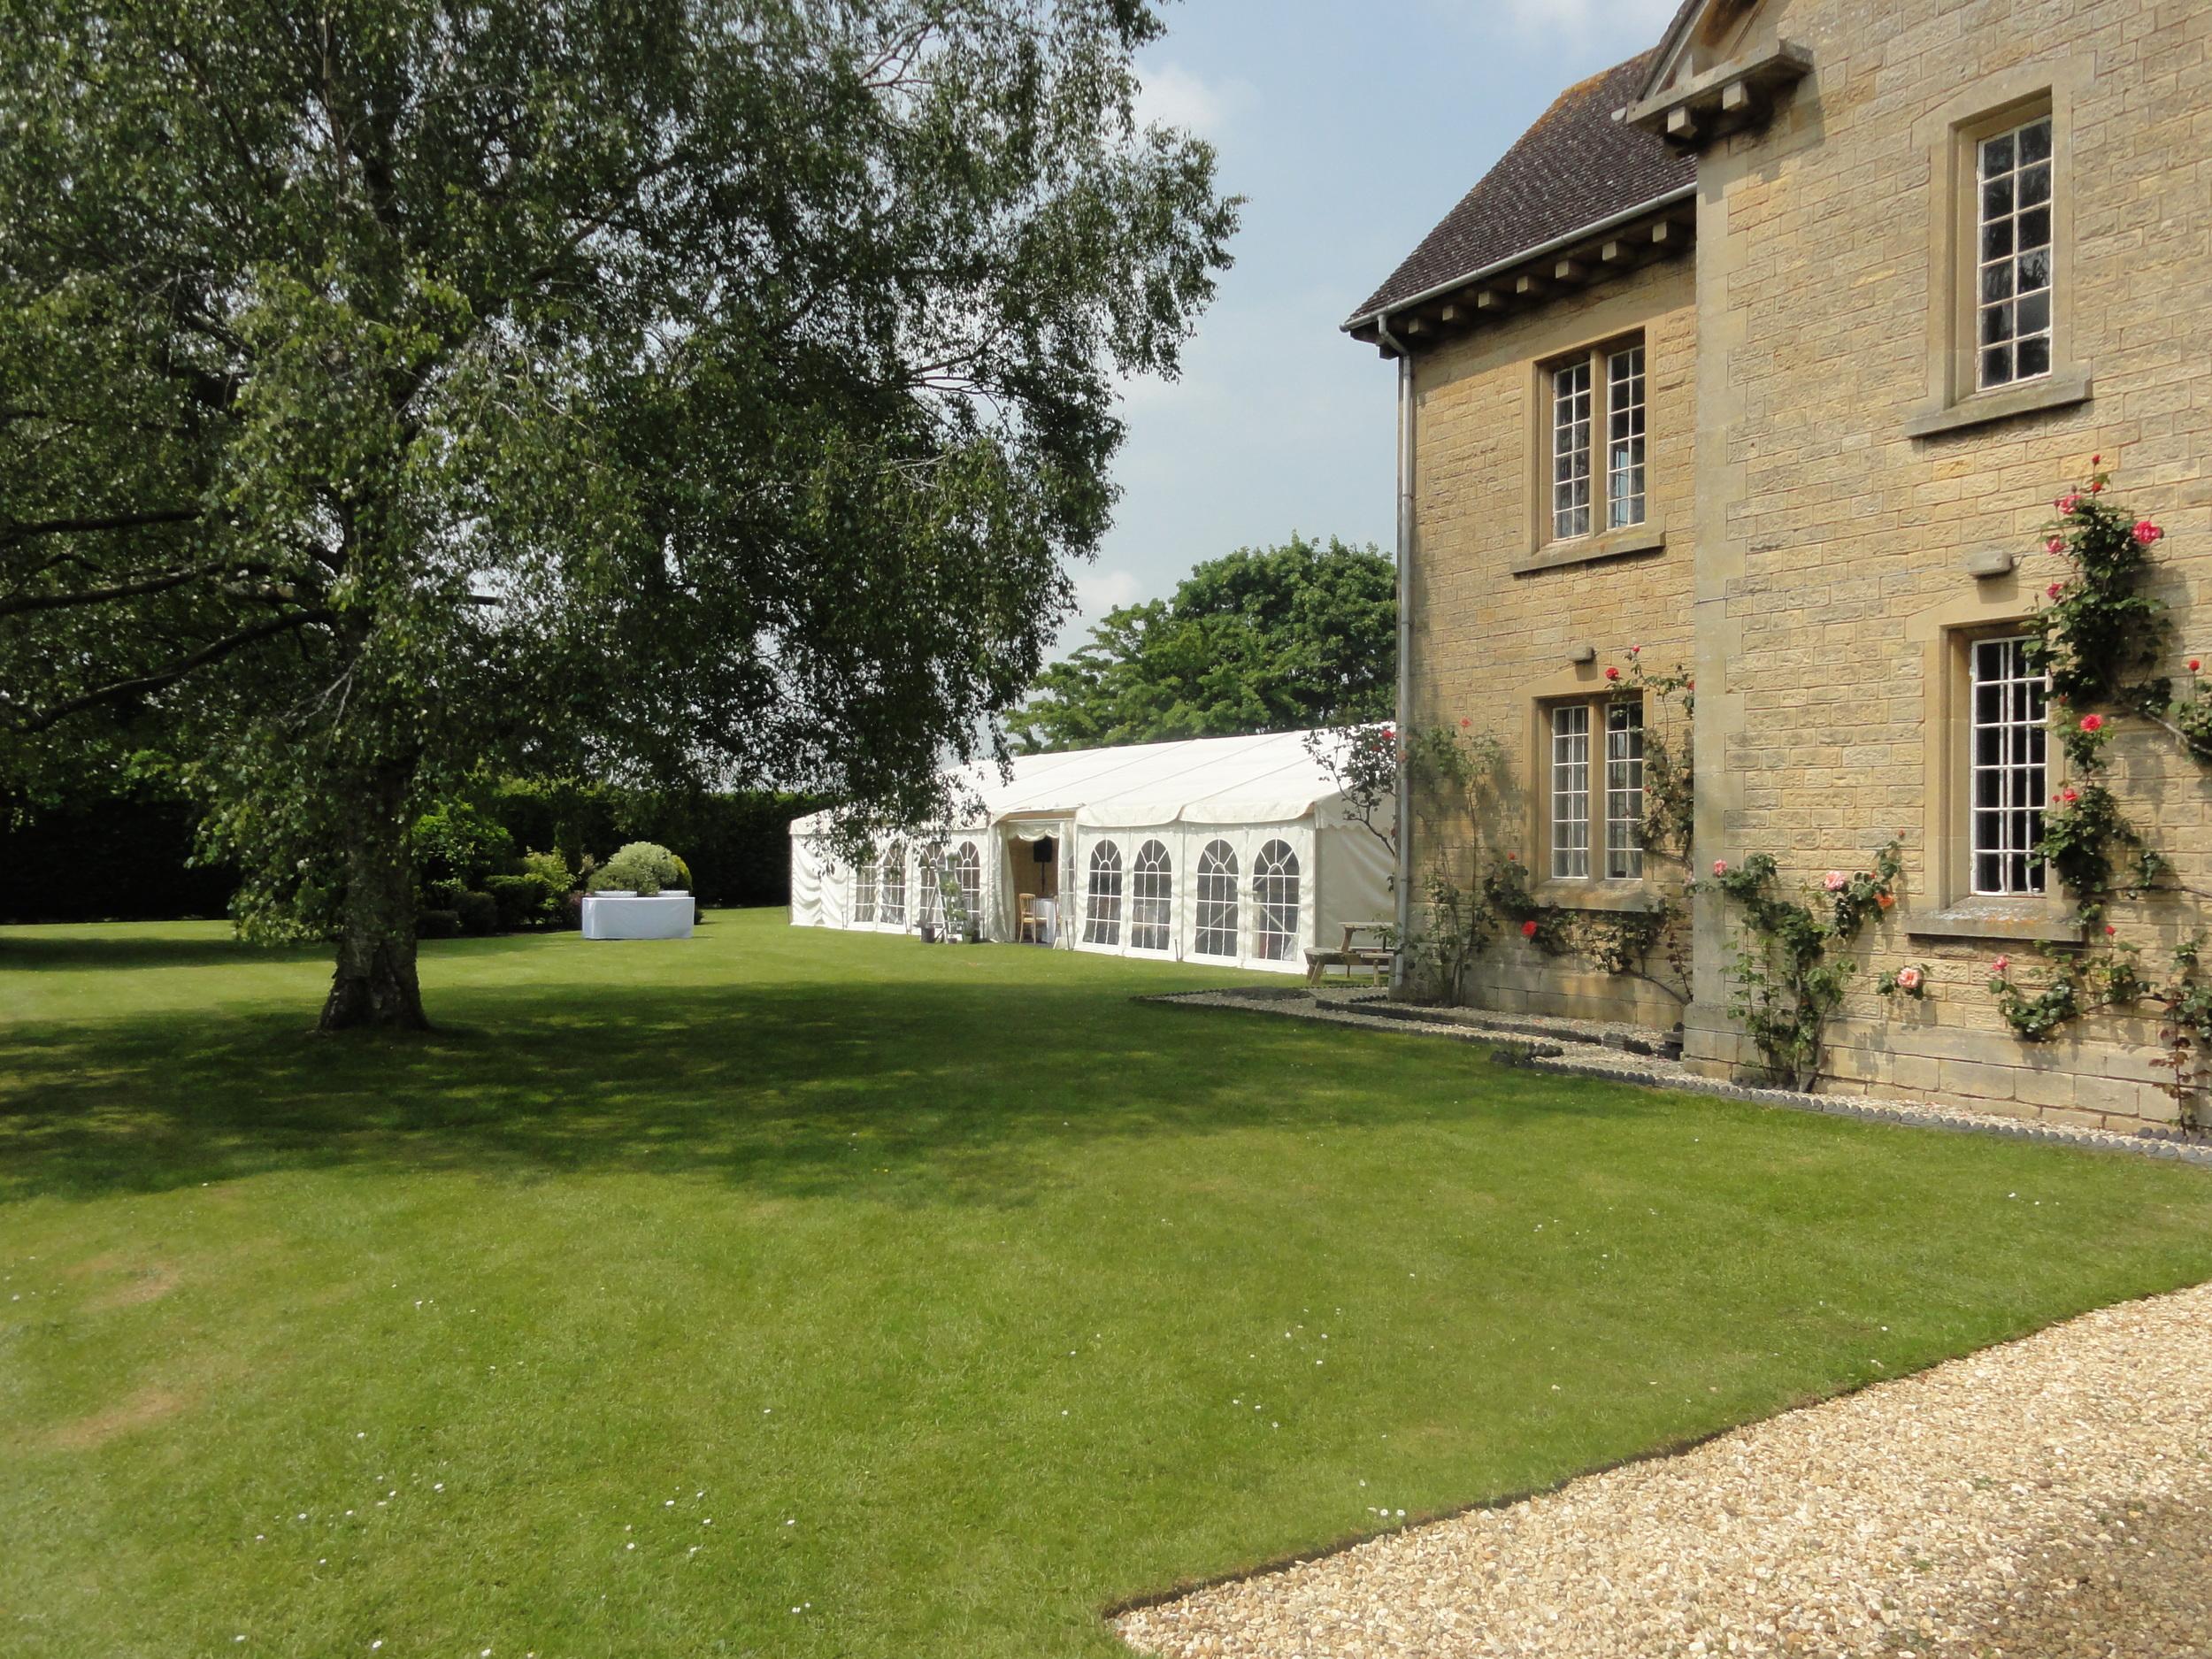 Entrance to The Moretons Farmhouse's walled garden